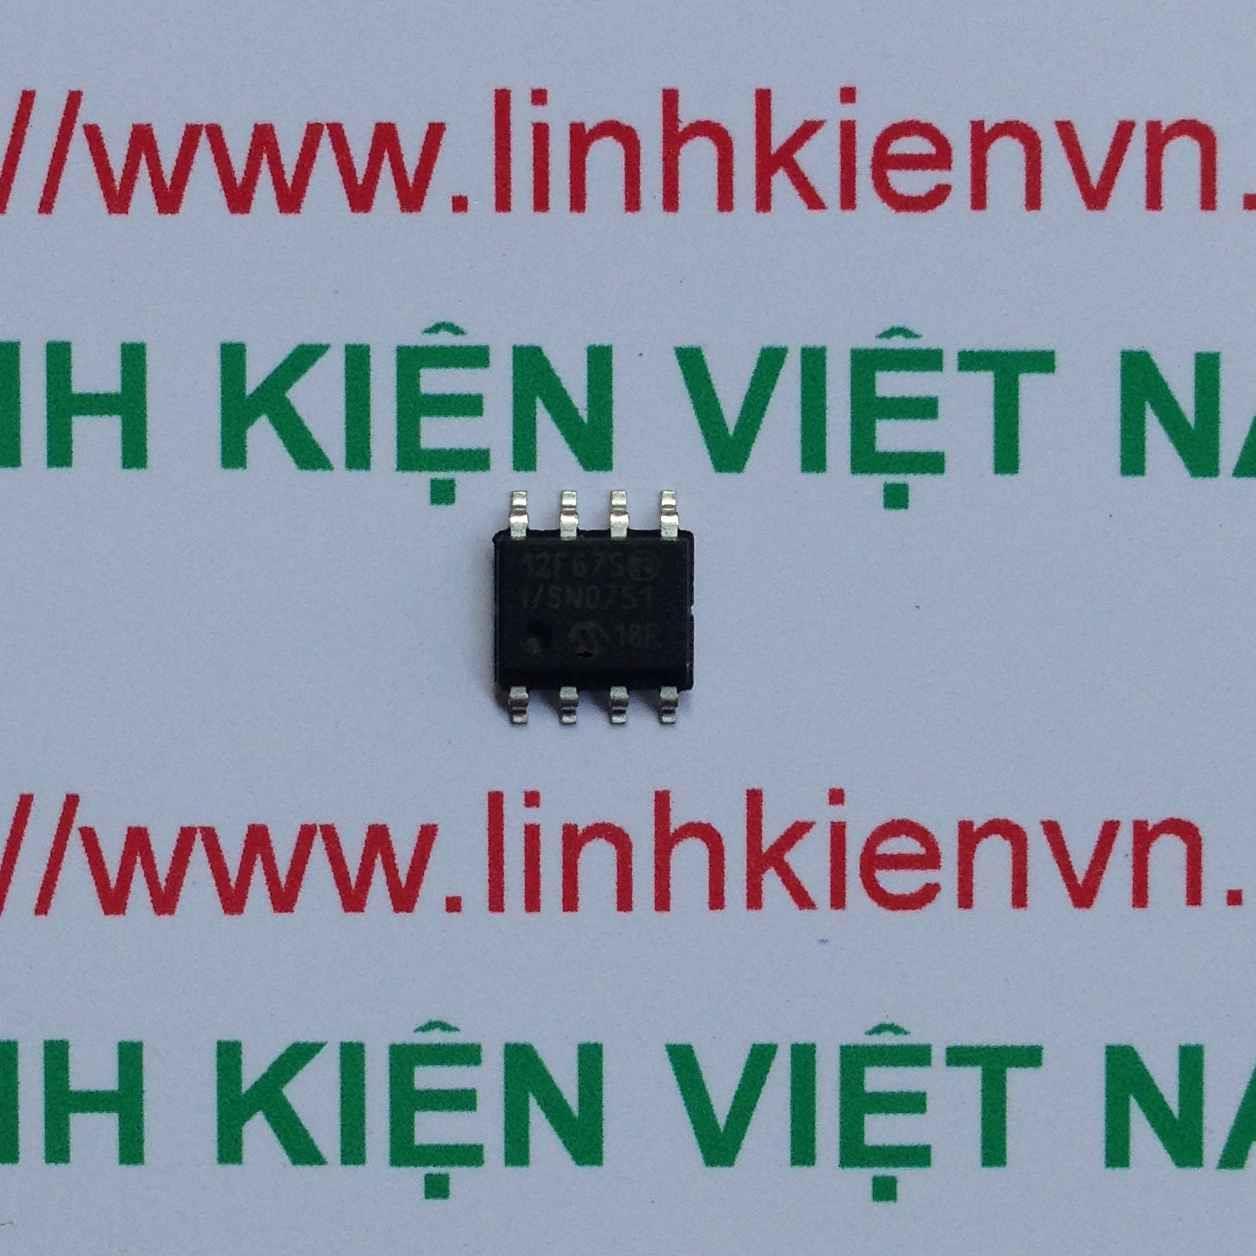 IC SMD PIC12F675 SOP8 12F675 - F6H12